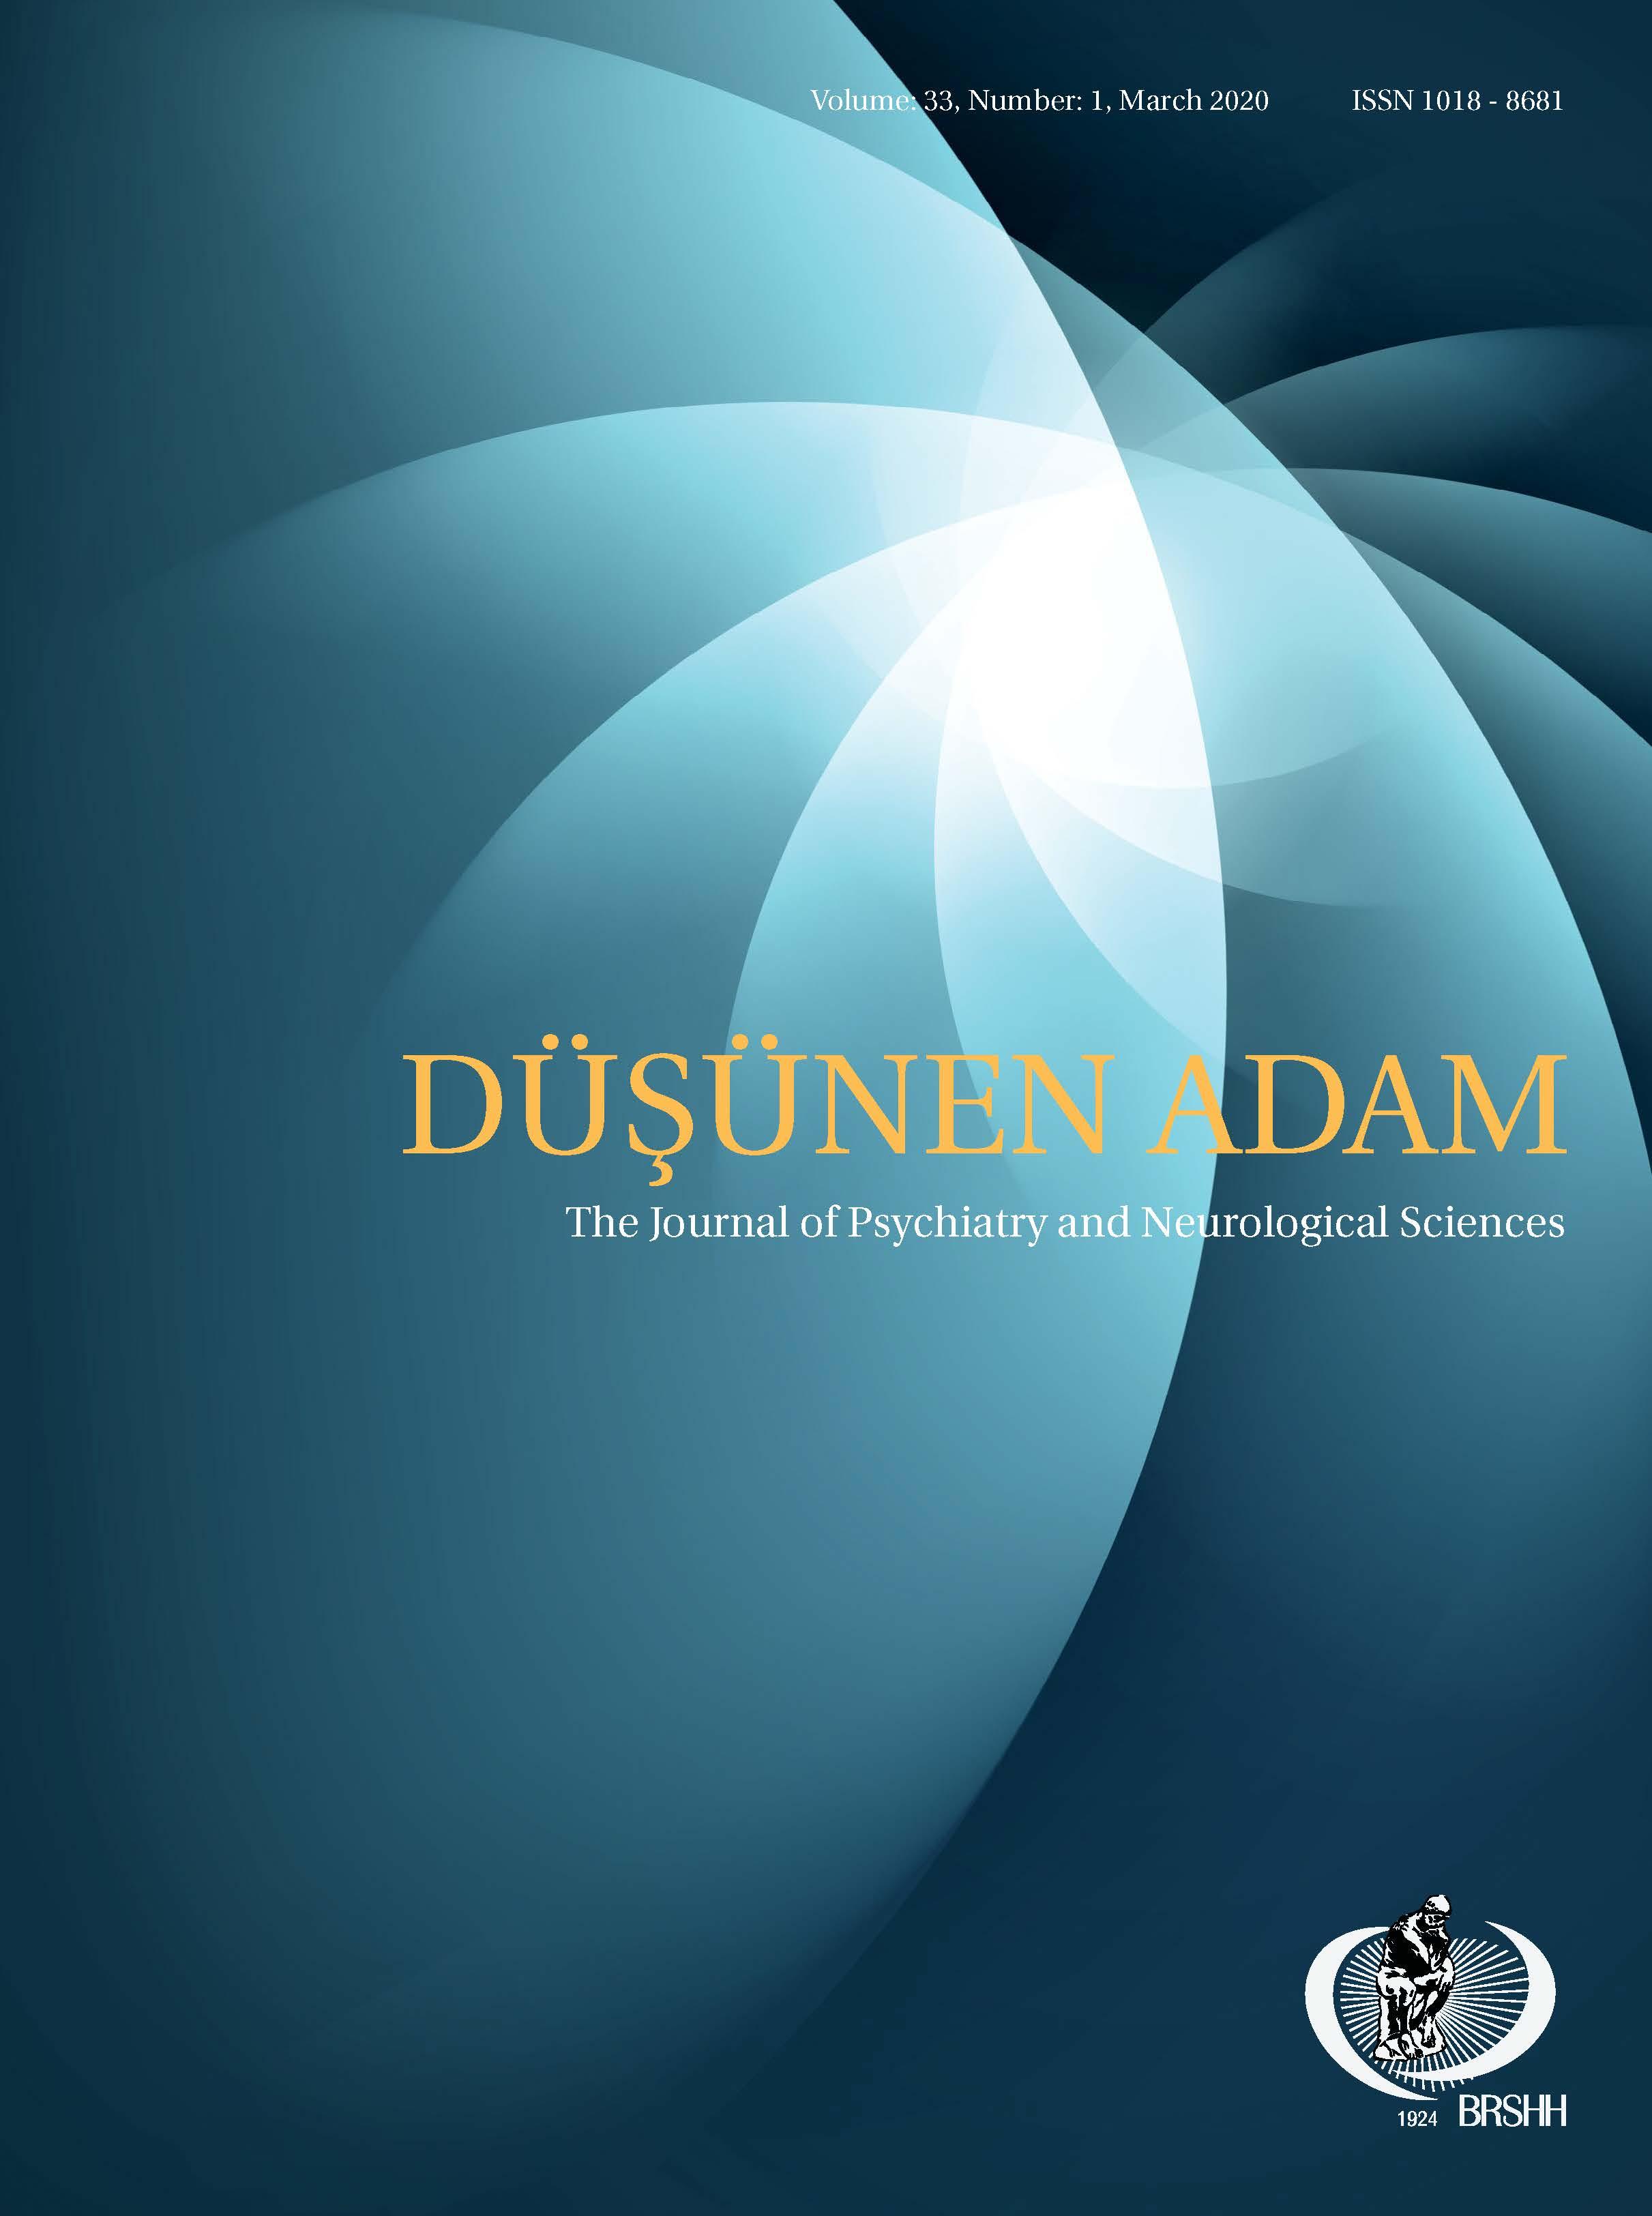 Volume: 33 Issue: 2 Year: 2020 Dusunen Adam The Journal of ...